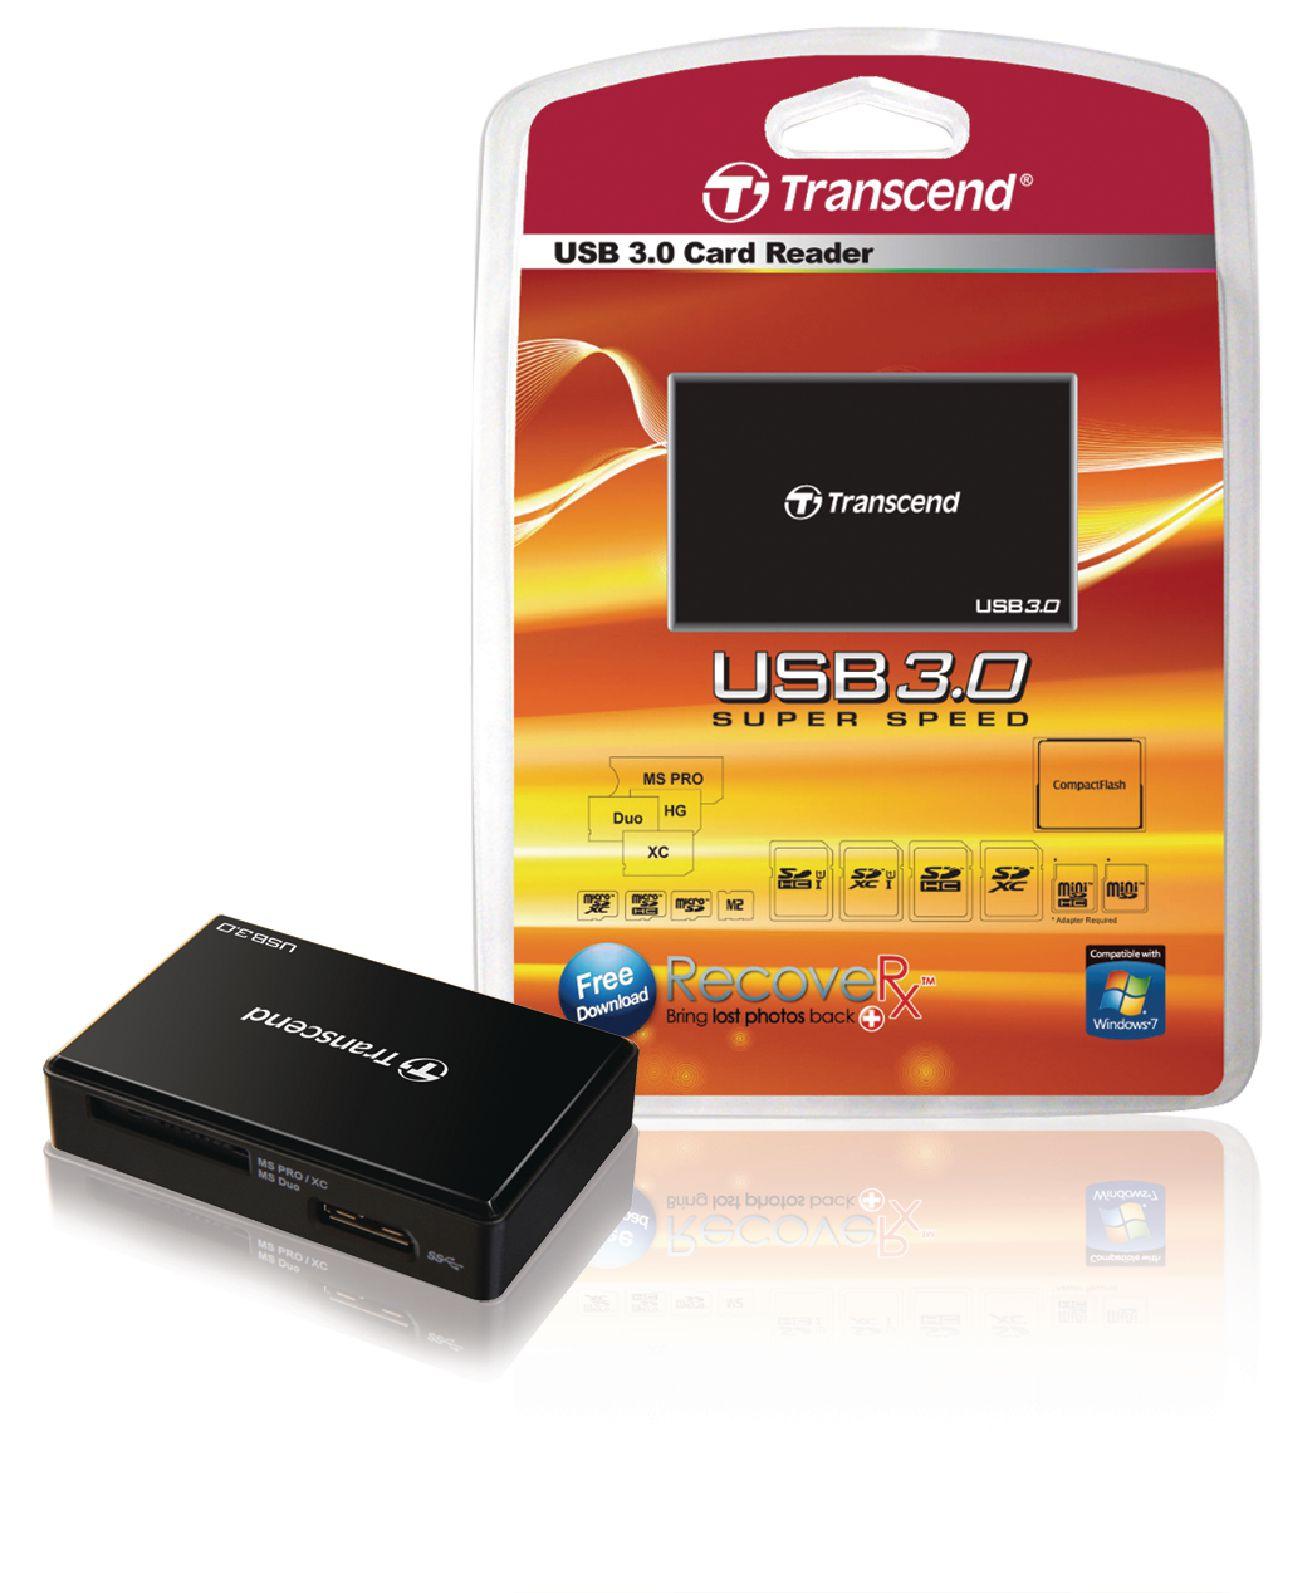 Kortalesari Transcend Usb3 Ts Rdf8k Card Reader Rdf8 White Usb 30 All In 1 Multi Backwards Compatible